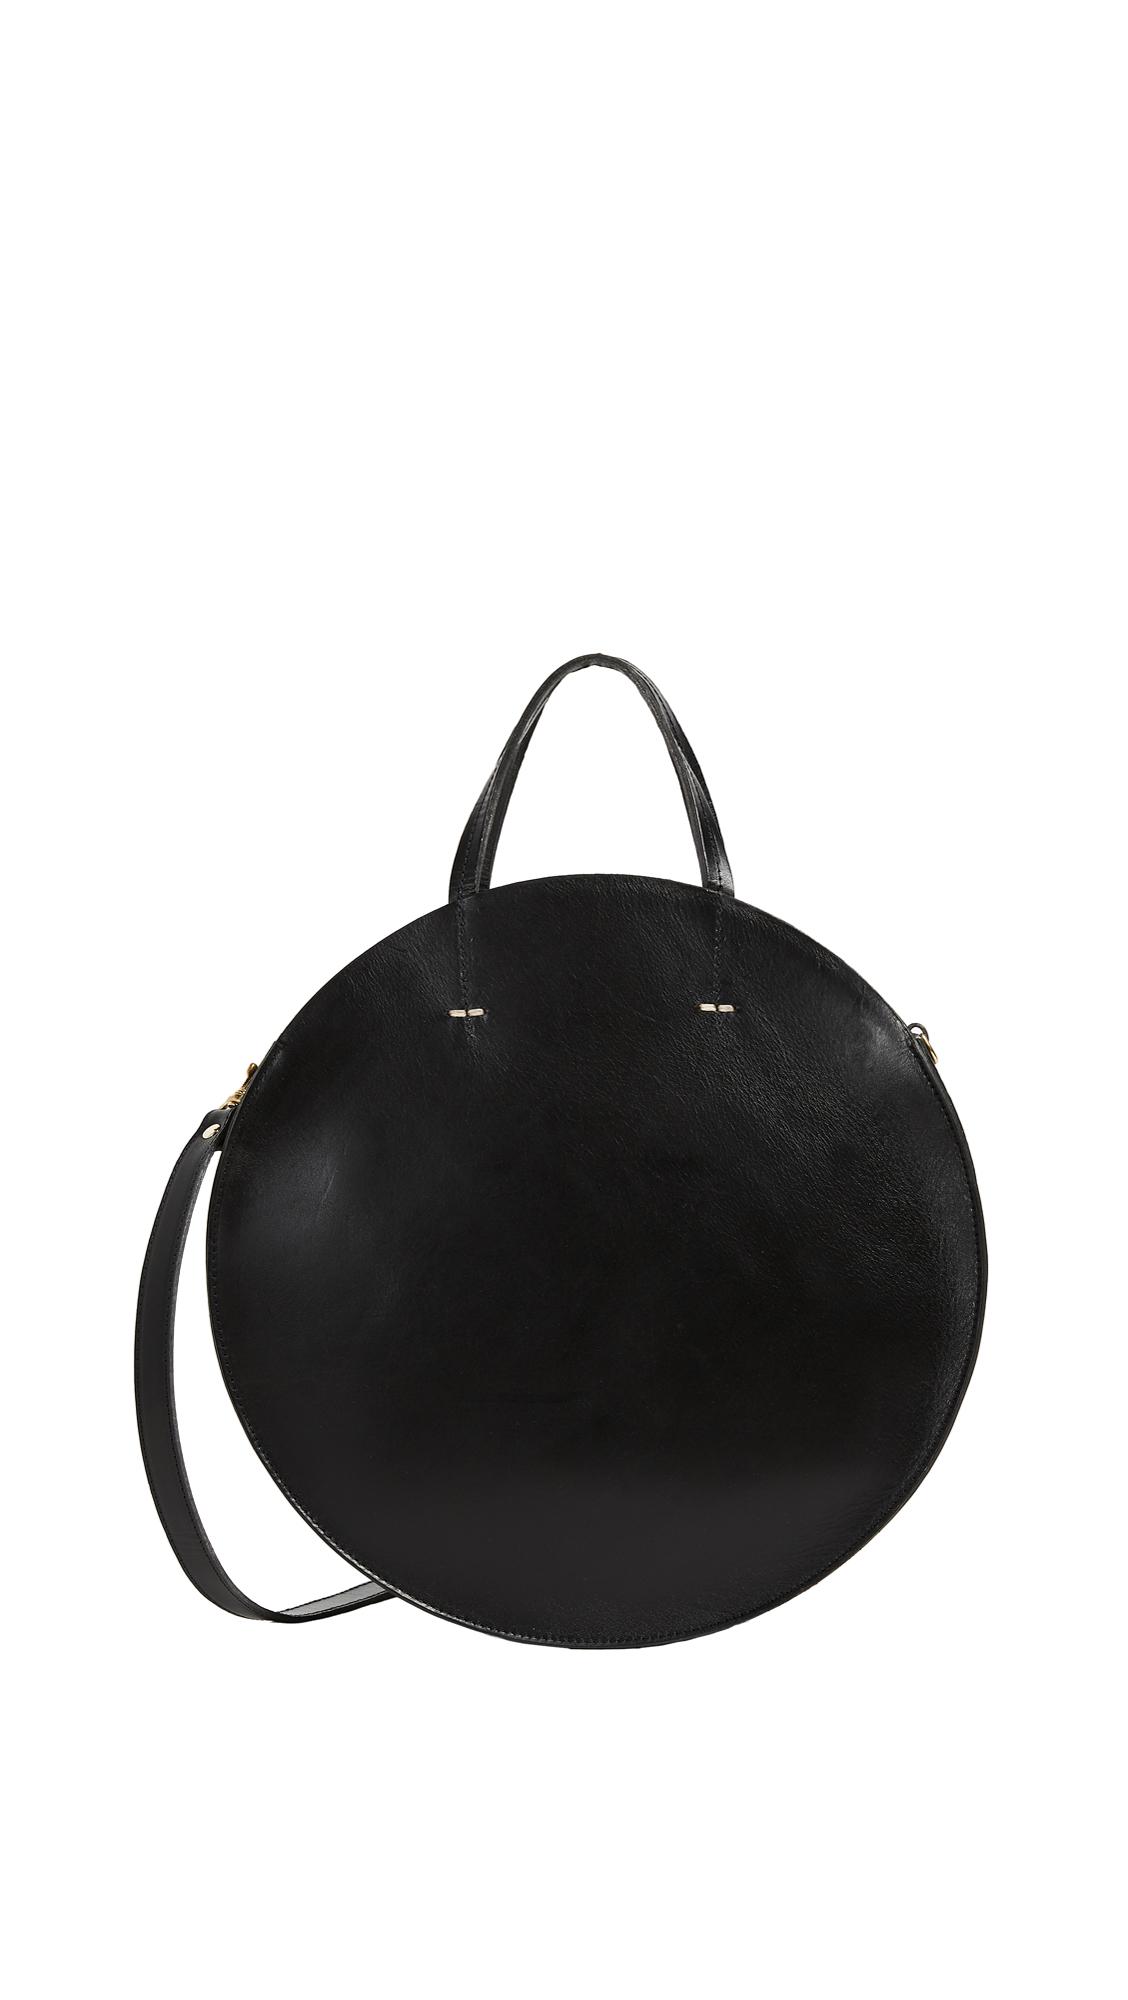 Clare V. Alistair Circle Bag - Black